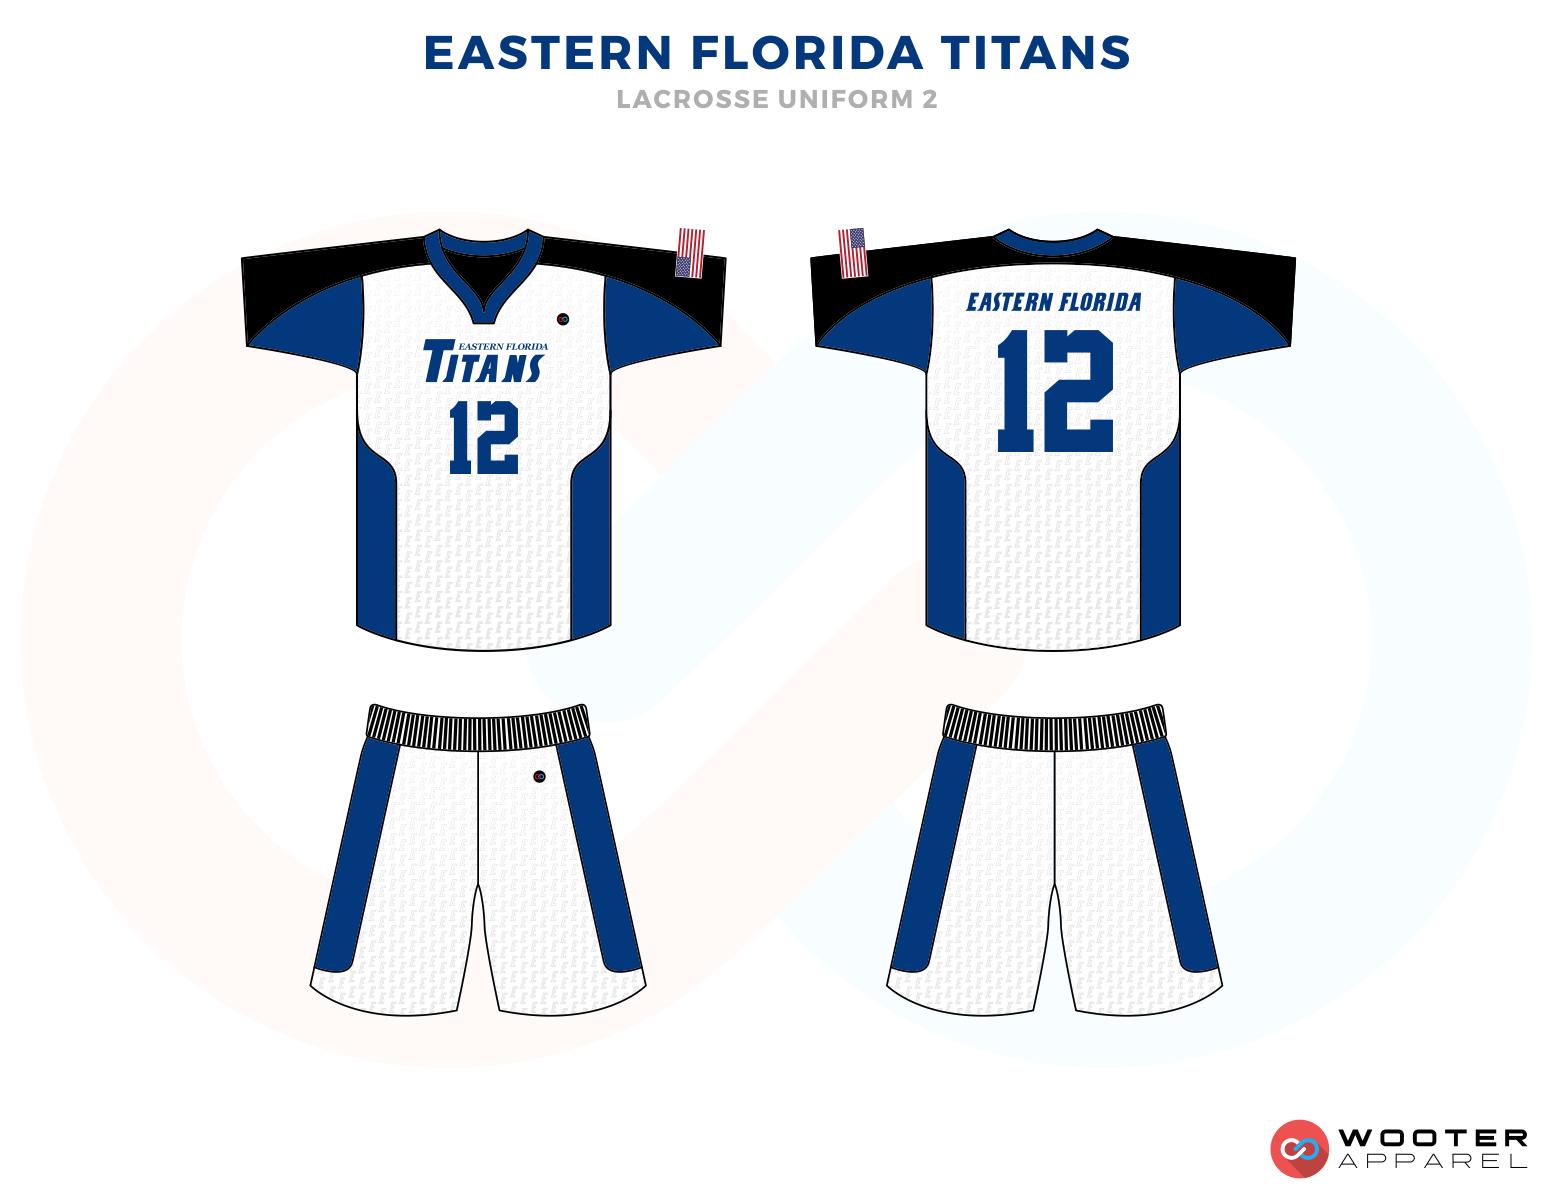 EASTERN FLORIDA TITANS blue white black School lacrosse uniforms jerseys tops shorts